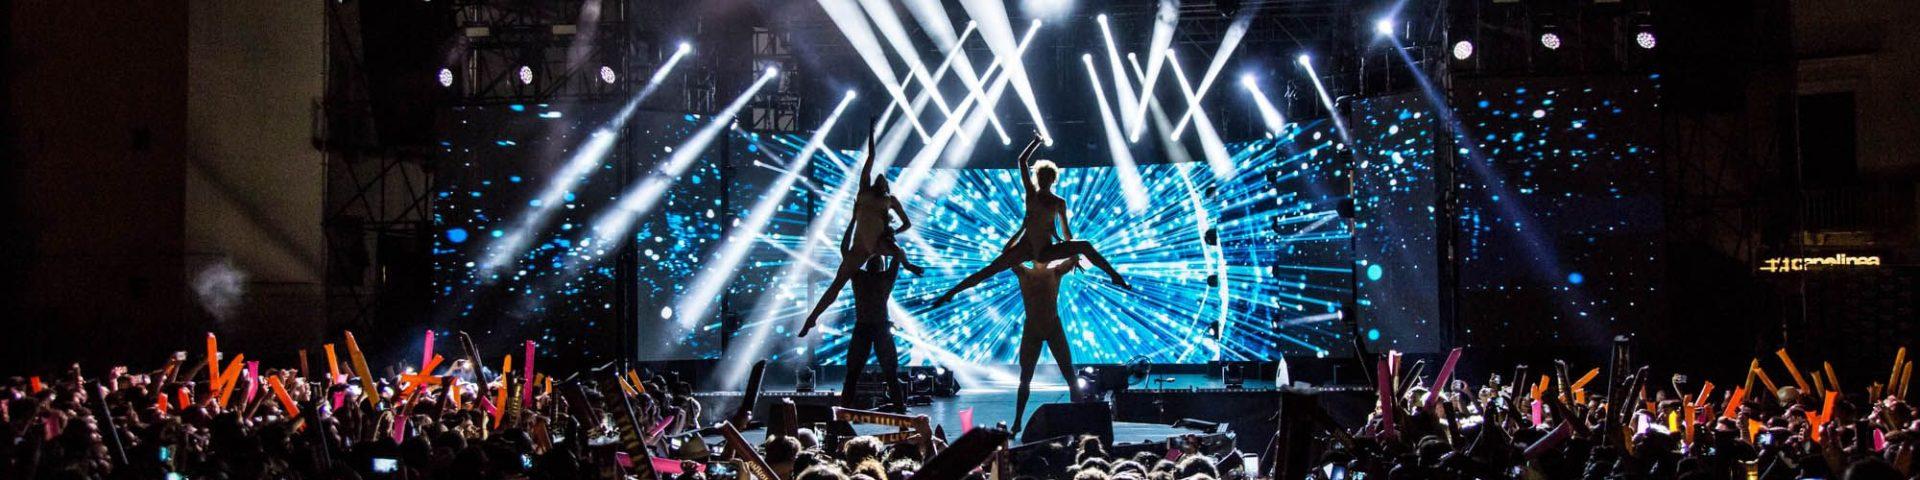 Battiti Live 2019 a Brindisi